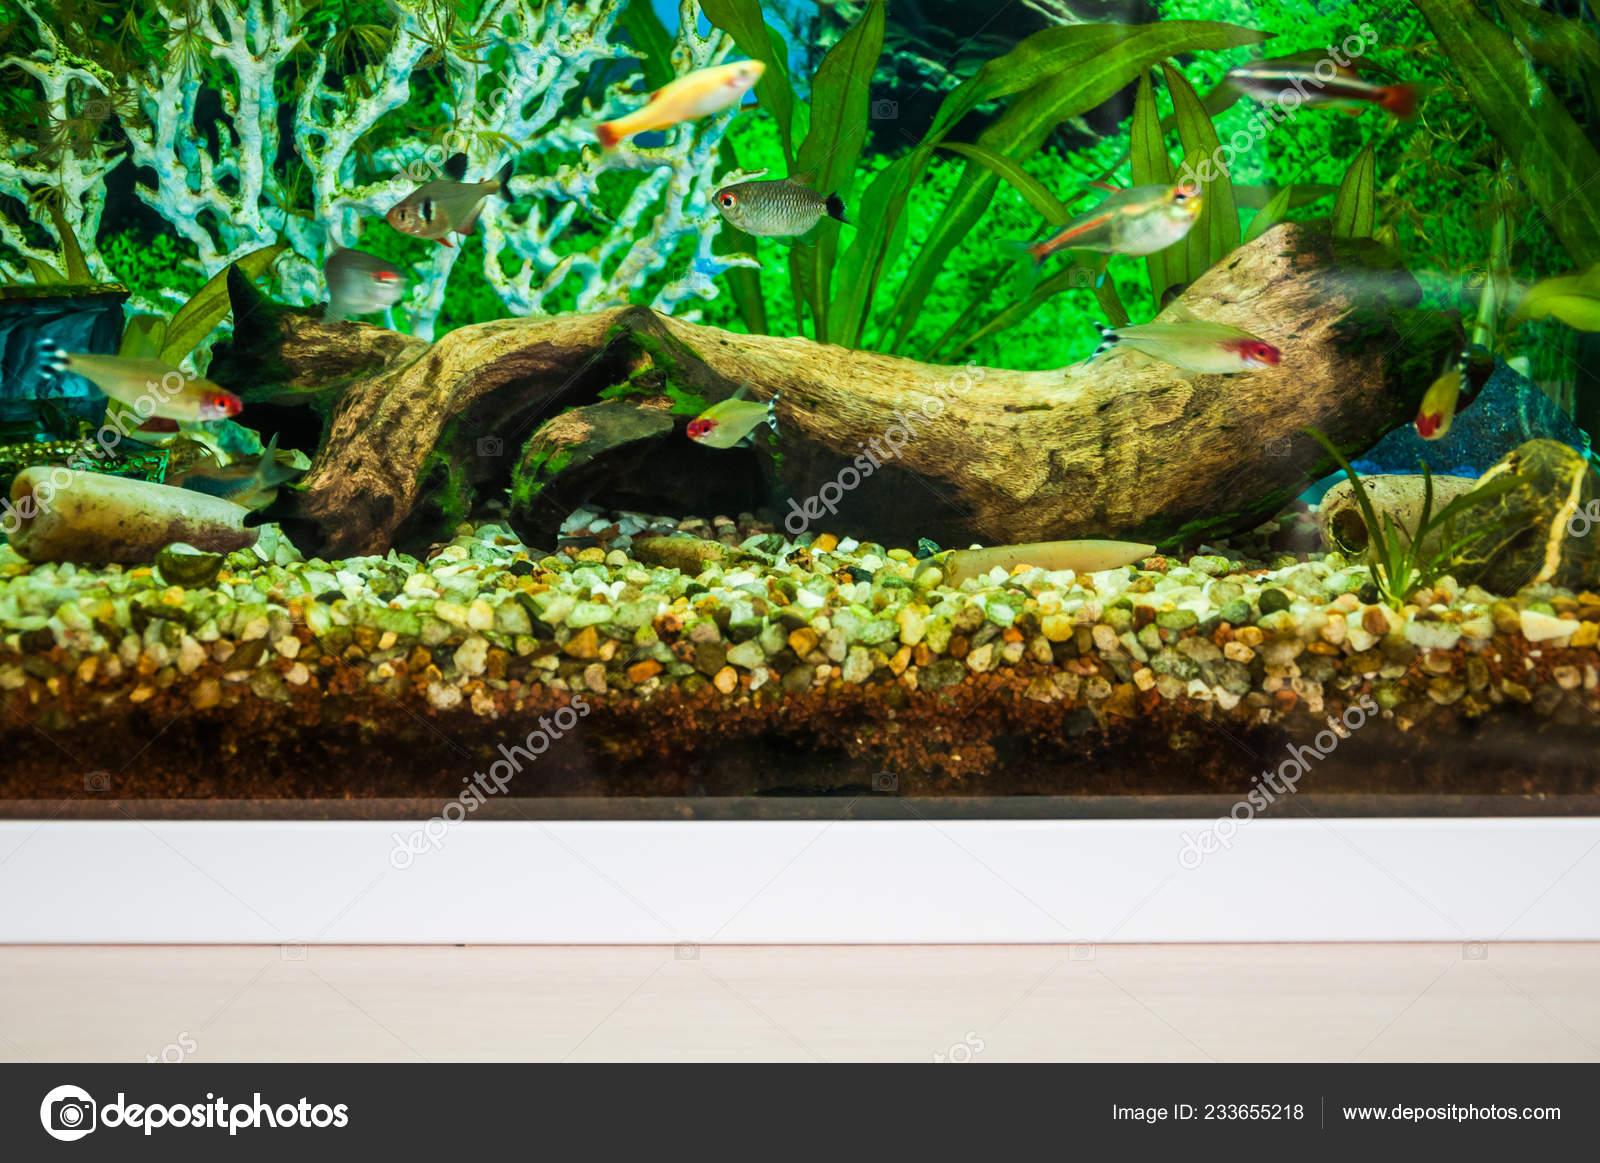 Fragment Home Aquarium Decorations Mangrove Snags Stones